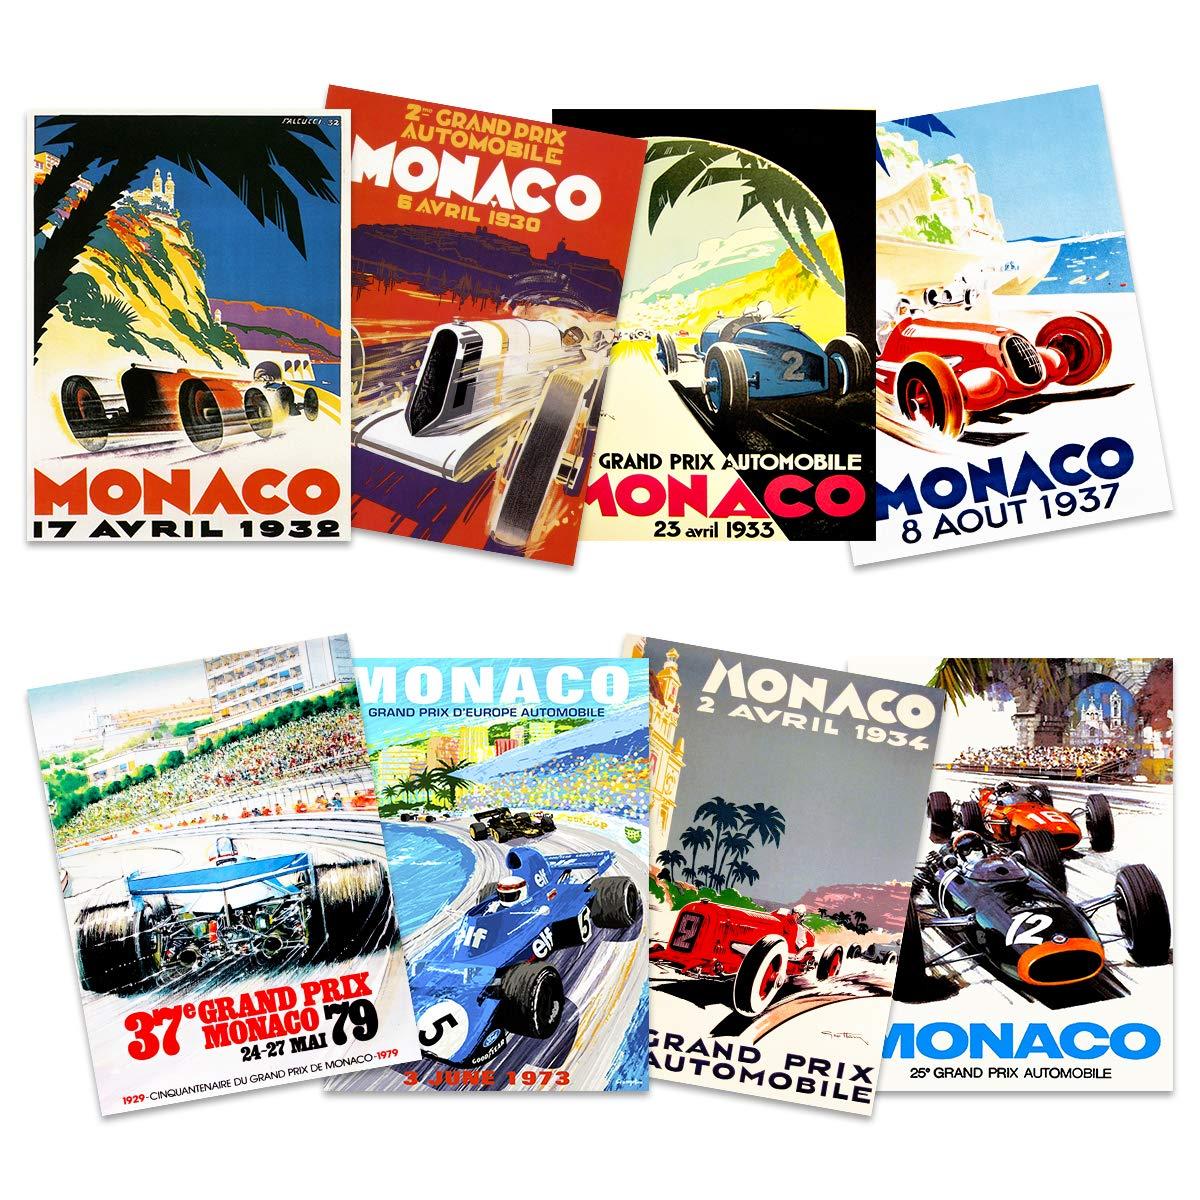 Monaco Grand Prix Classic Racing Motor Sport Advert Mixed Home Decor Premium Wall Art Poster Pack of 8 M�NACO grandioso Cl�Sico Carreras Deporte Publicidad Casa Pared P�ster: Amazon.es: Hogar